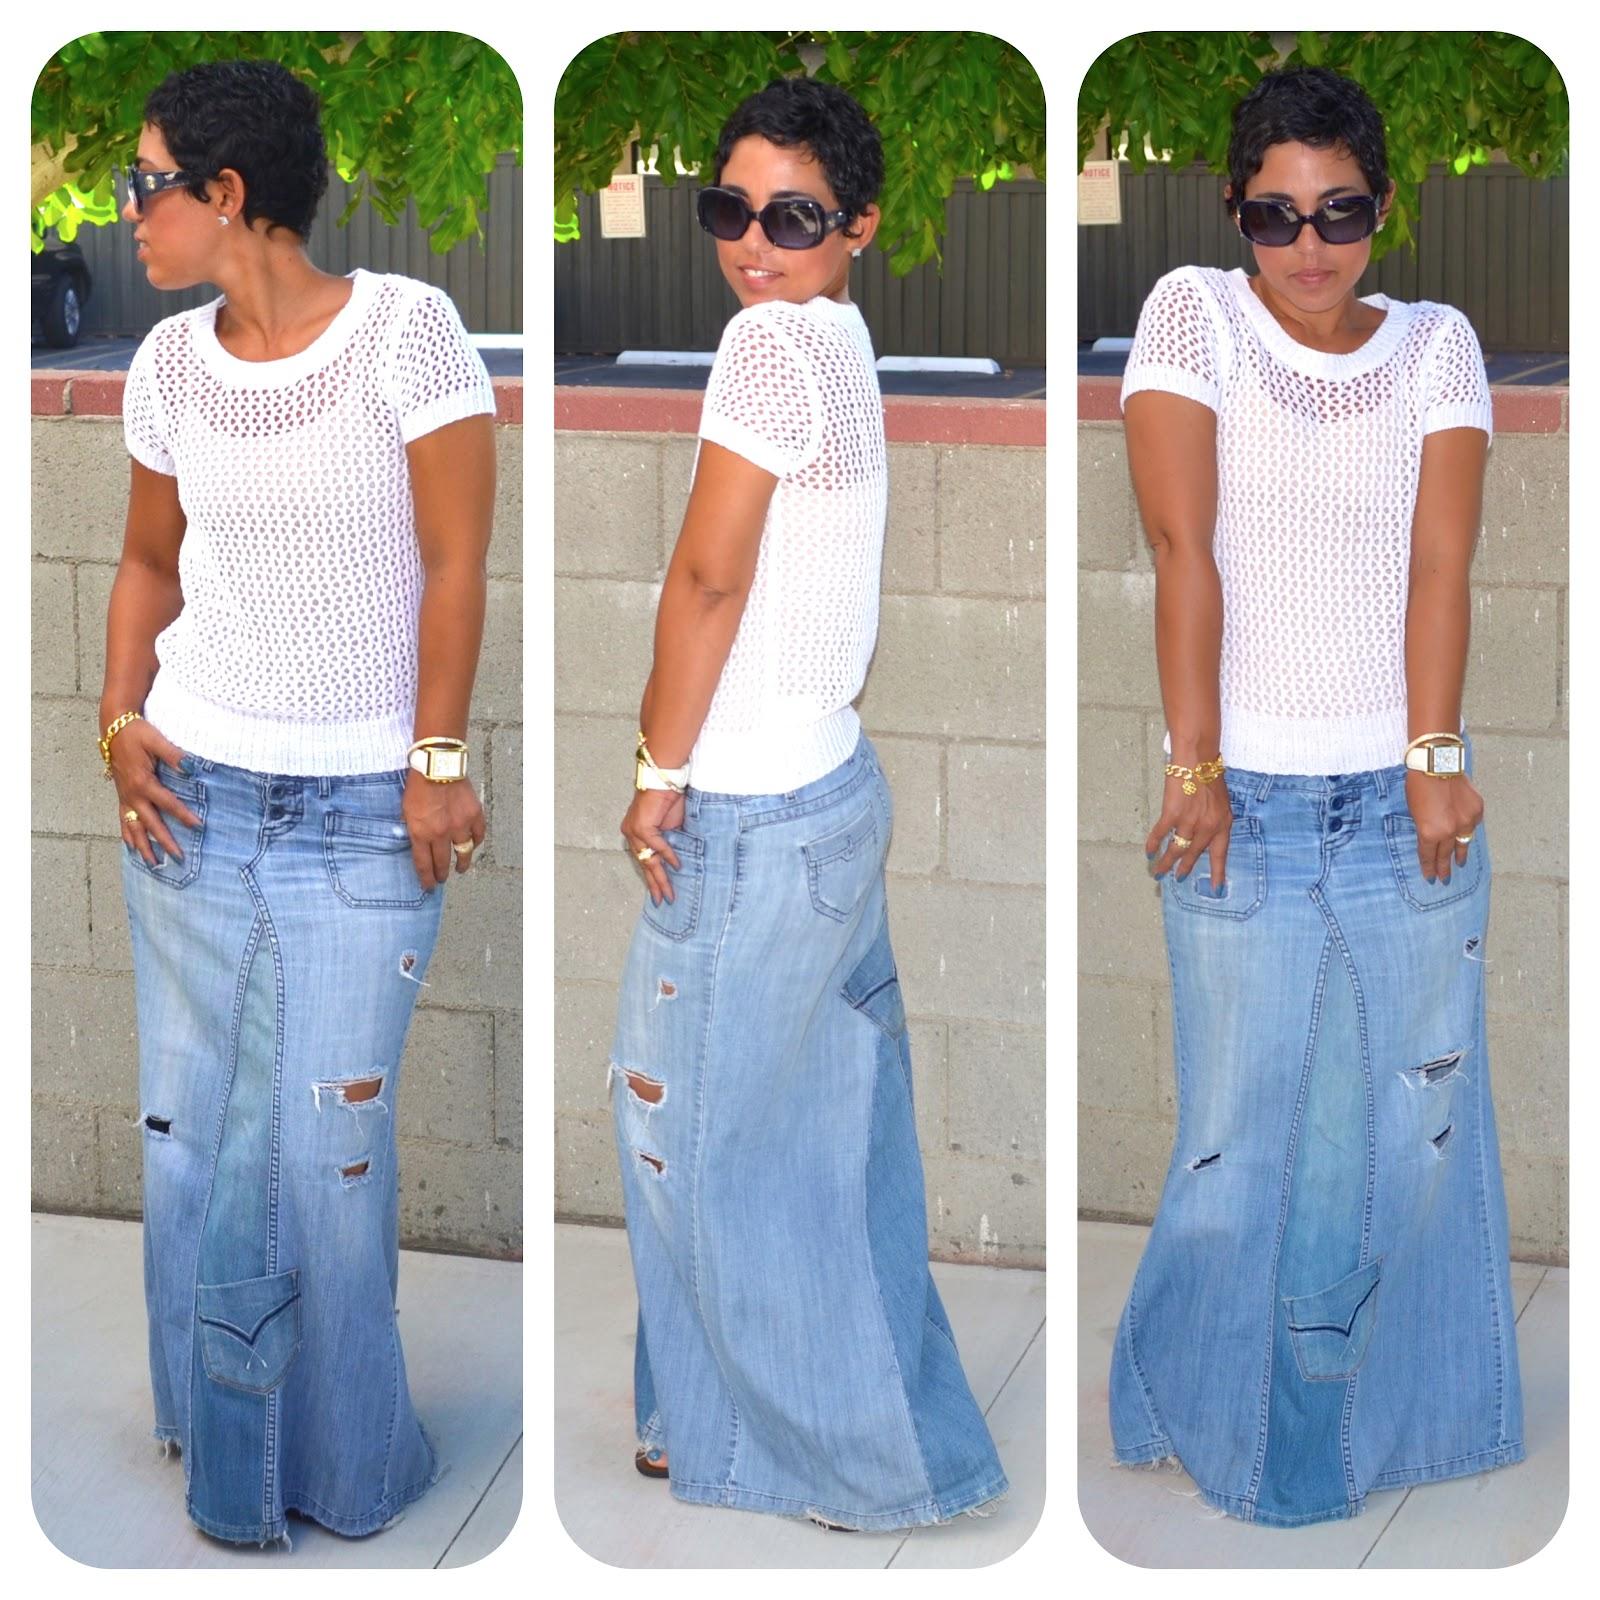 Mimi G. Fab DIY Picks + Today's Look |Fashion, Lifestyle ...